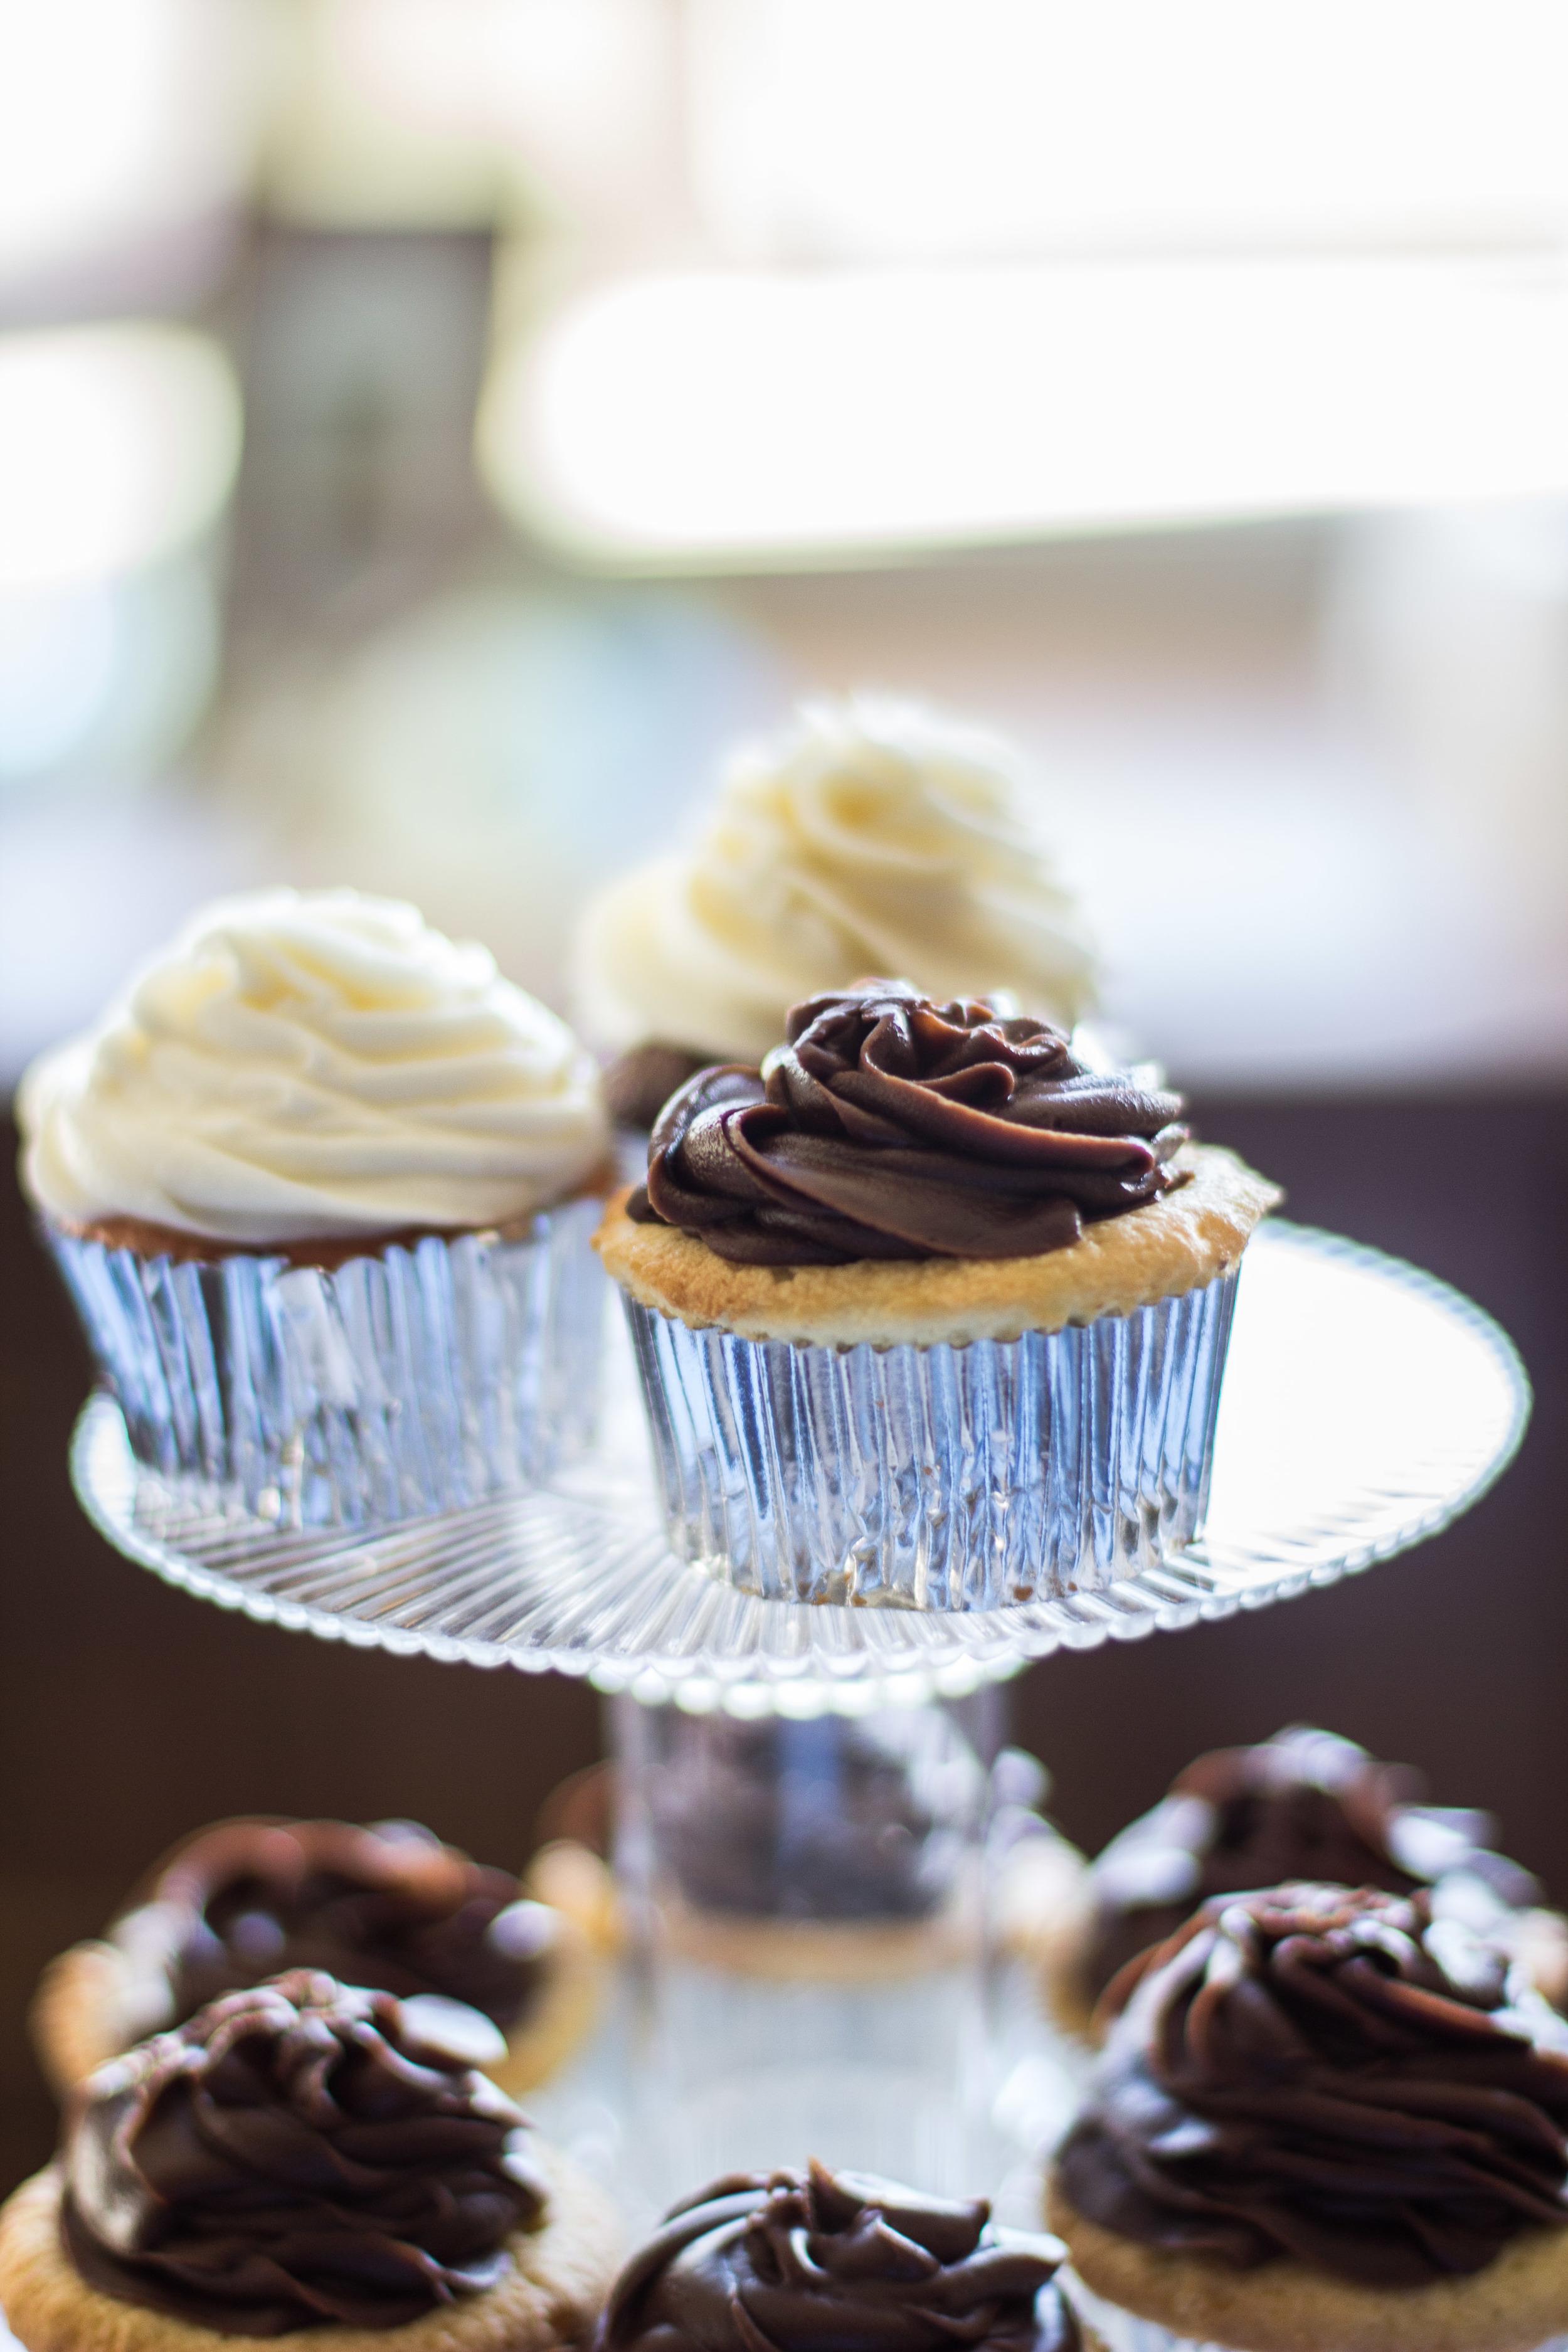 Cupcake Tier Rustic Aqua Sea Wedding Decor | Martinsborough Wedding Reception - Greenville NC | Bryant Tyson Photography